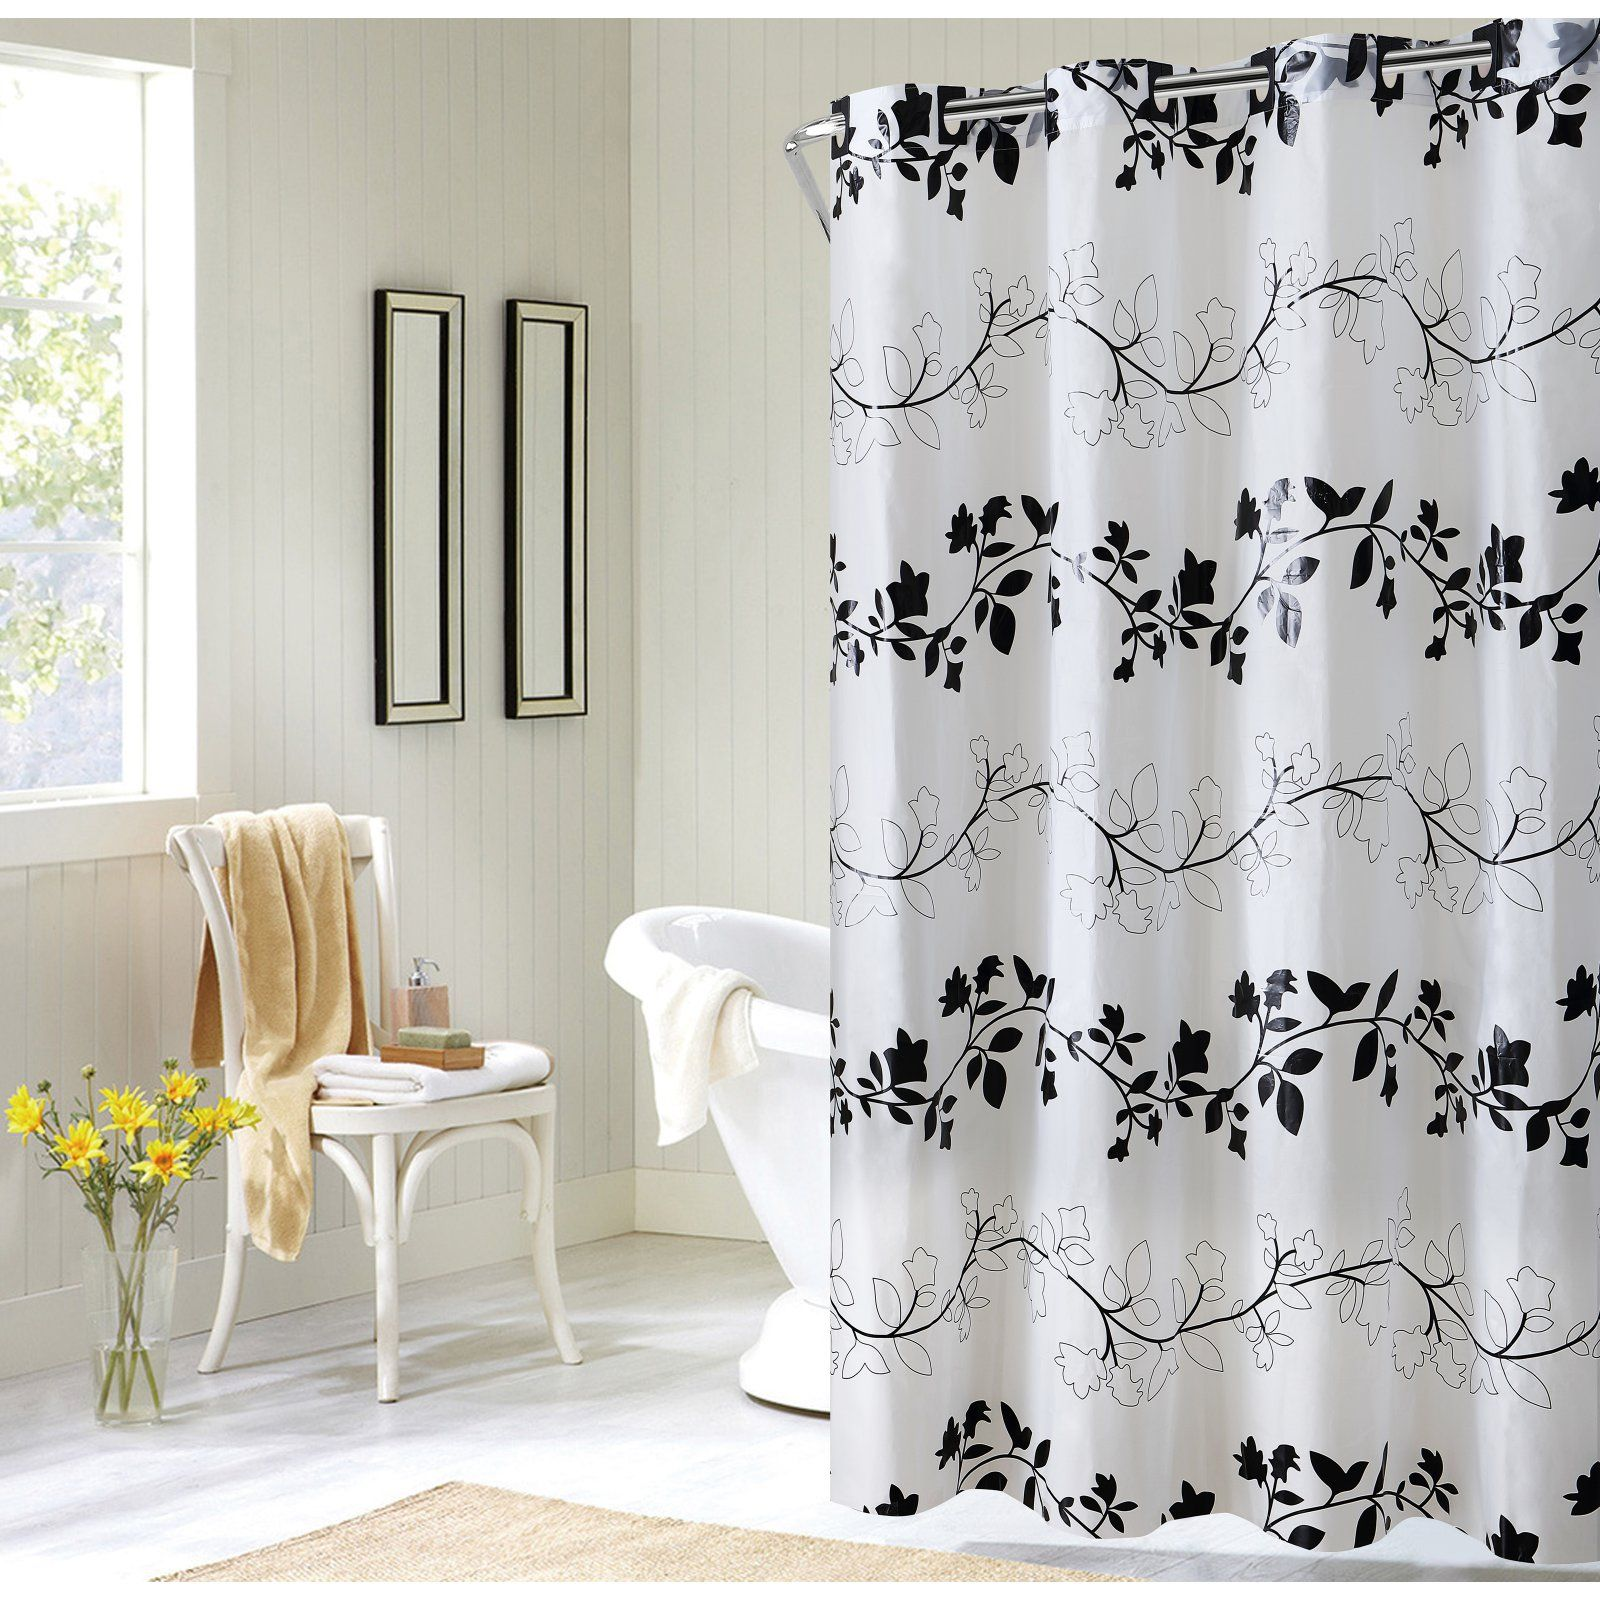 Ez On Floral Vine Shower Curtain Floral Shower Curtains Shower